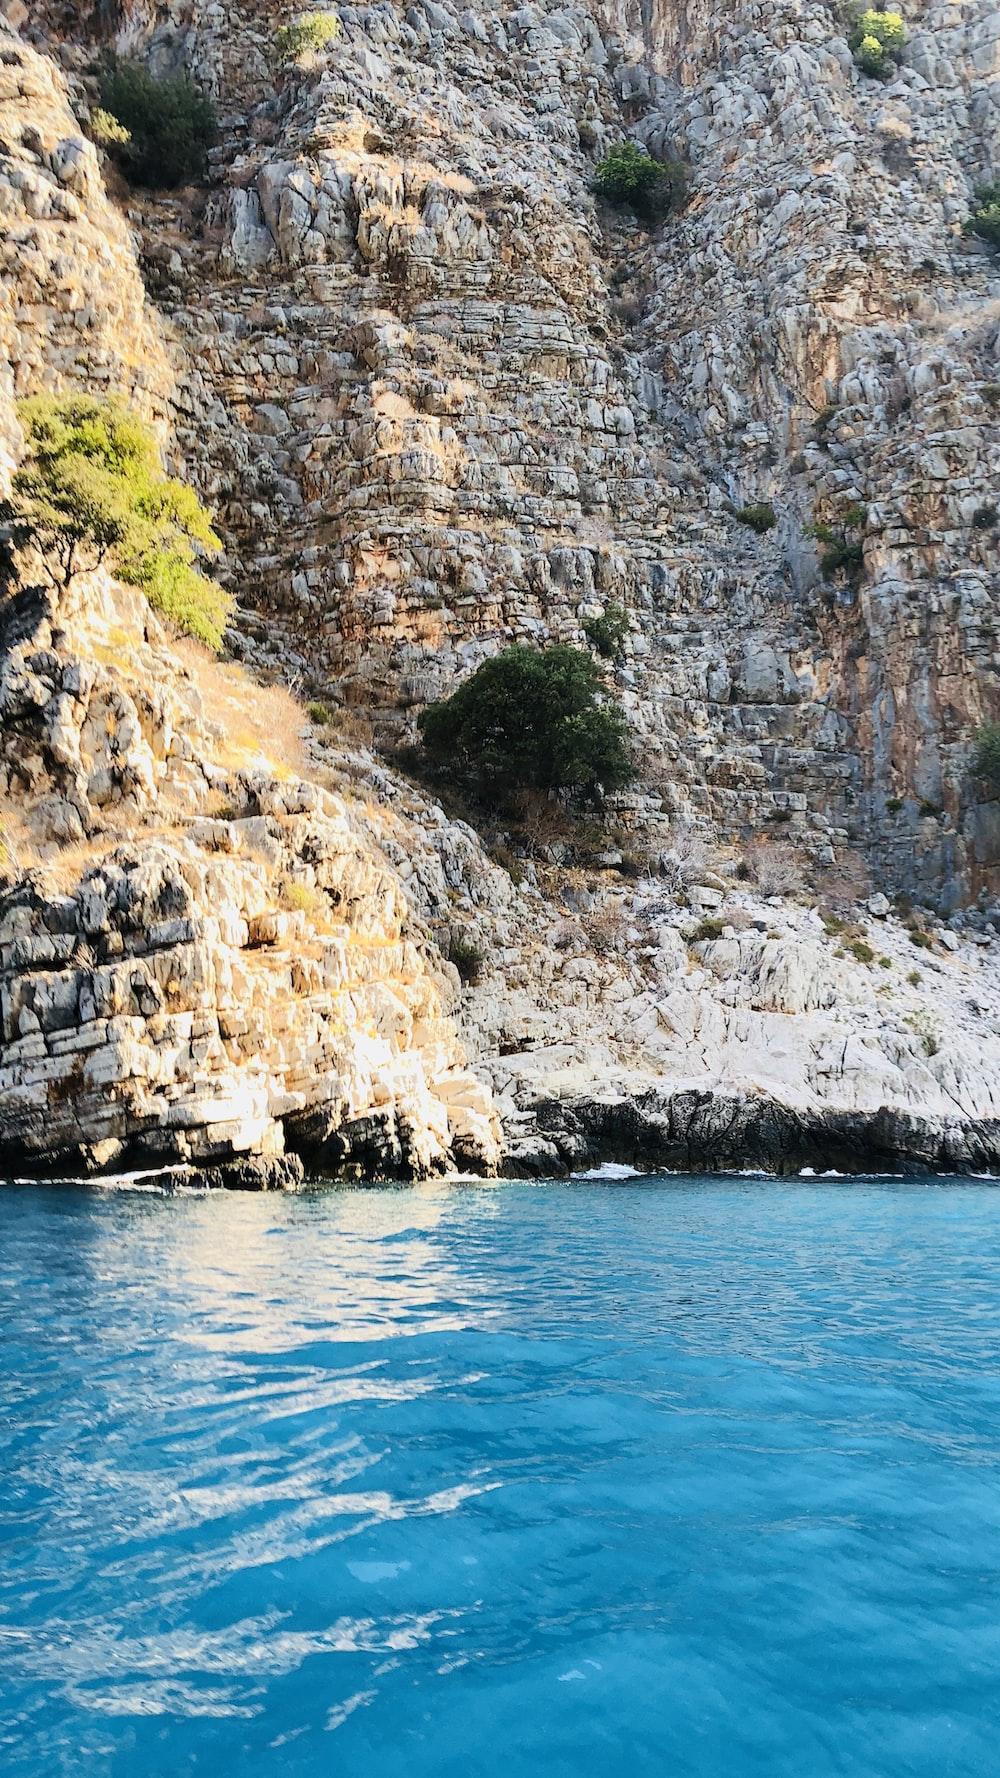 calm body of water near cliffs